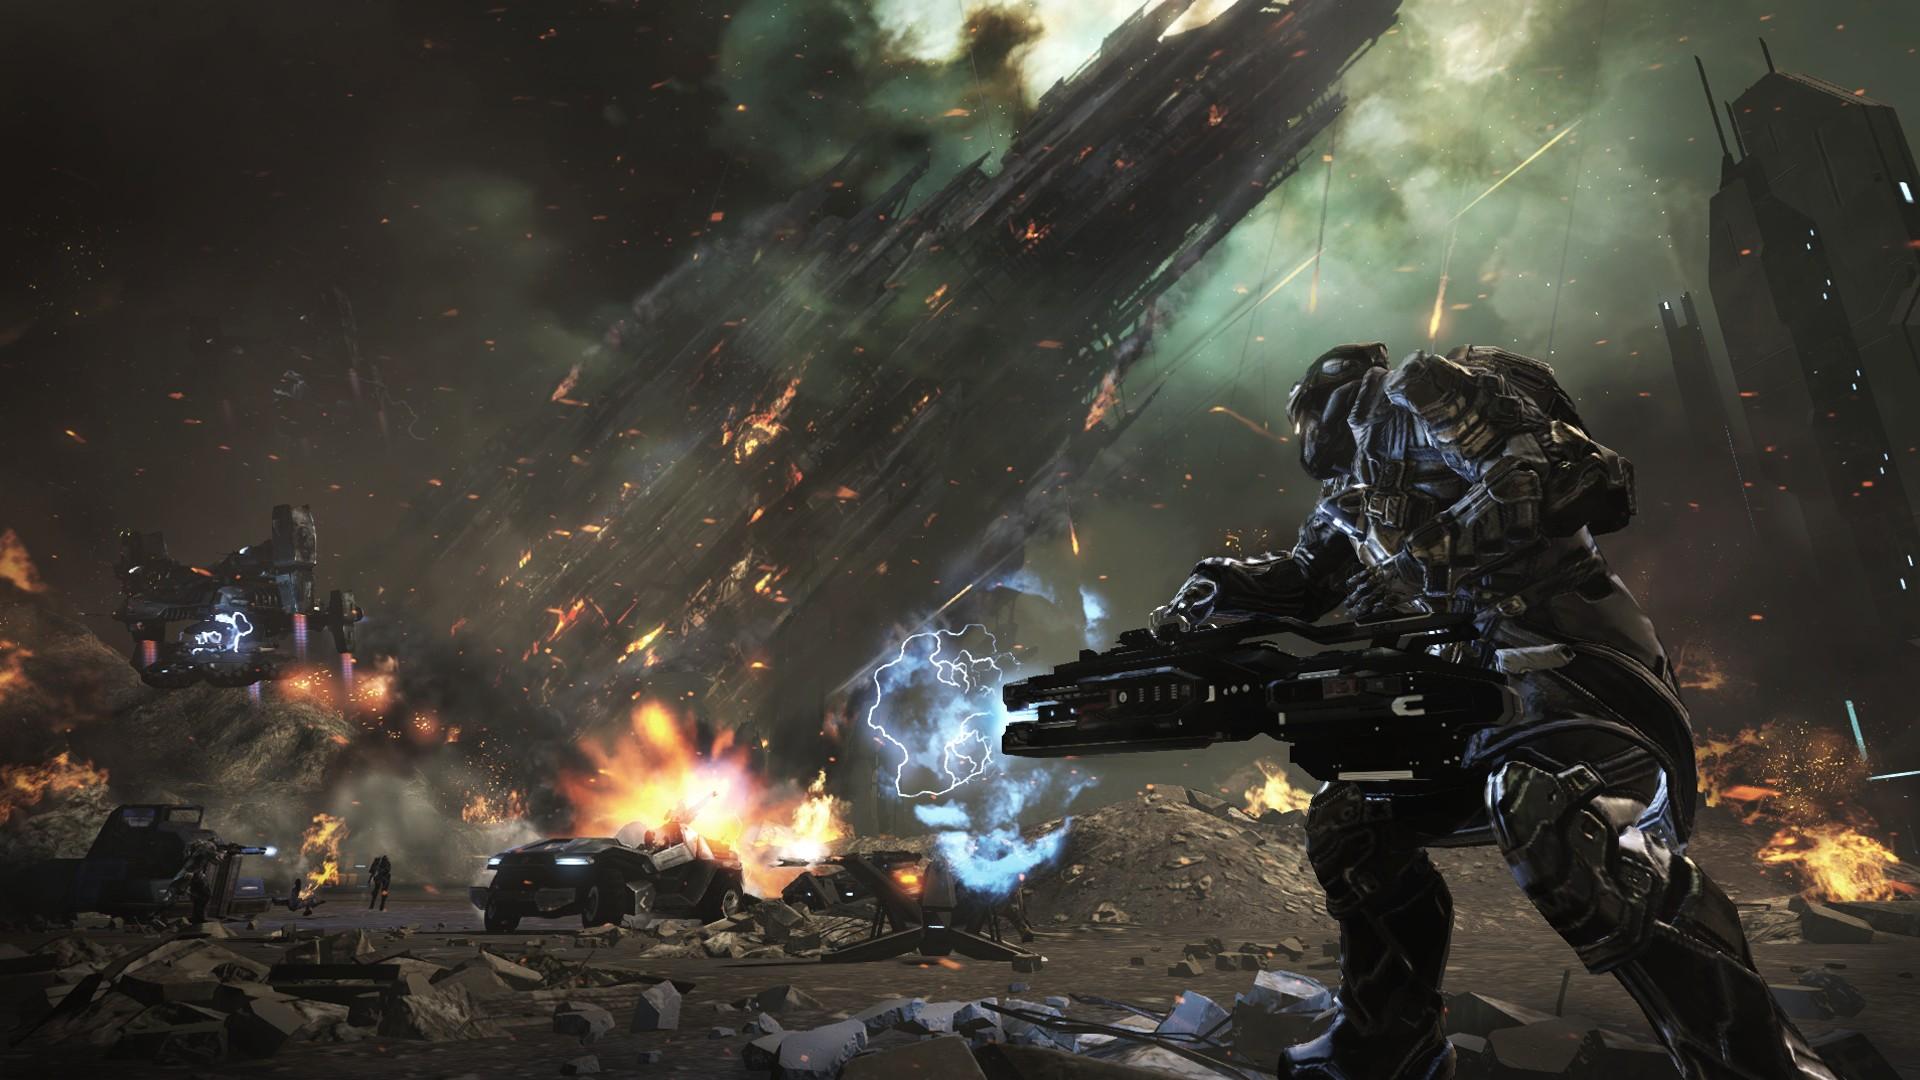 Killzone Shadow Fall Wallpaper 1080p Dust 514 Sci Fi Action Warrior Eve Weapon 21 Wallpaper